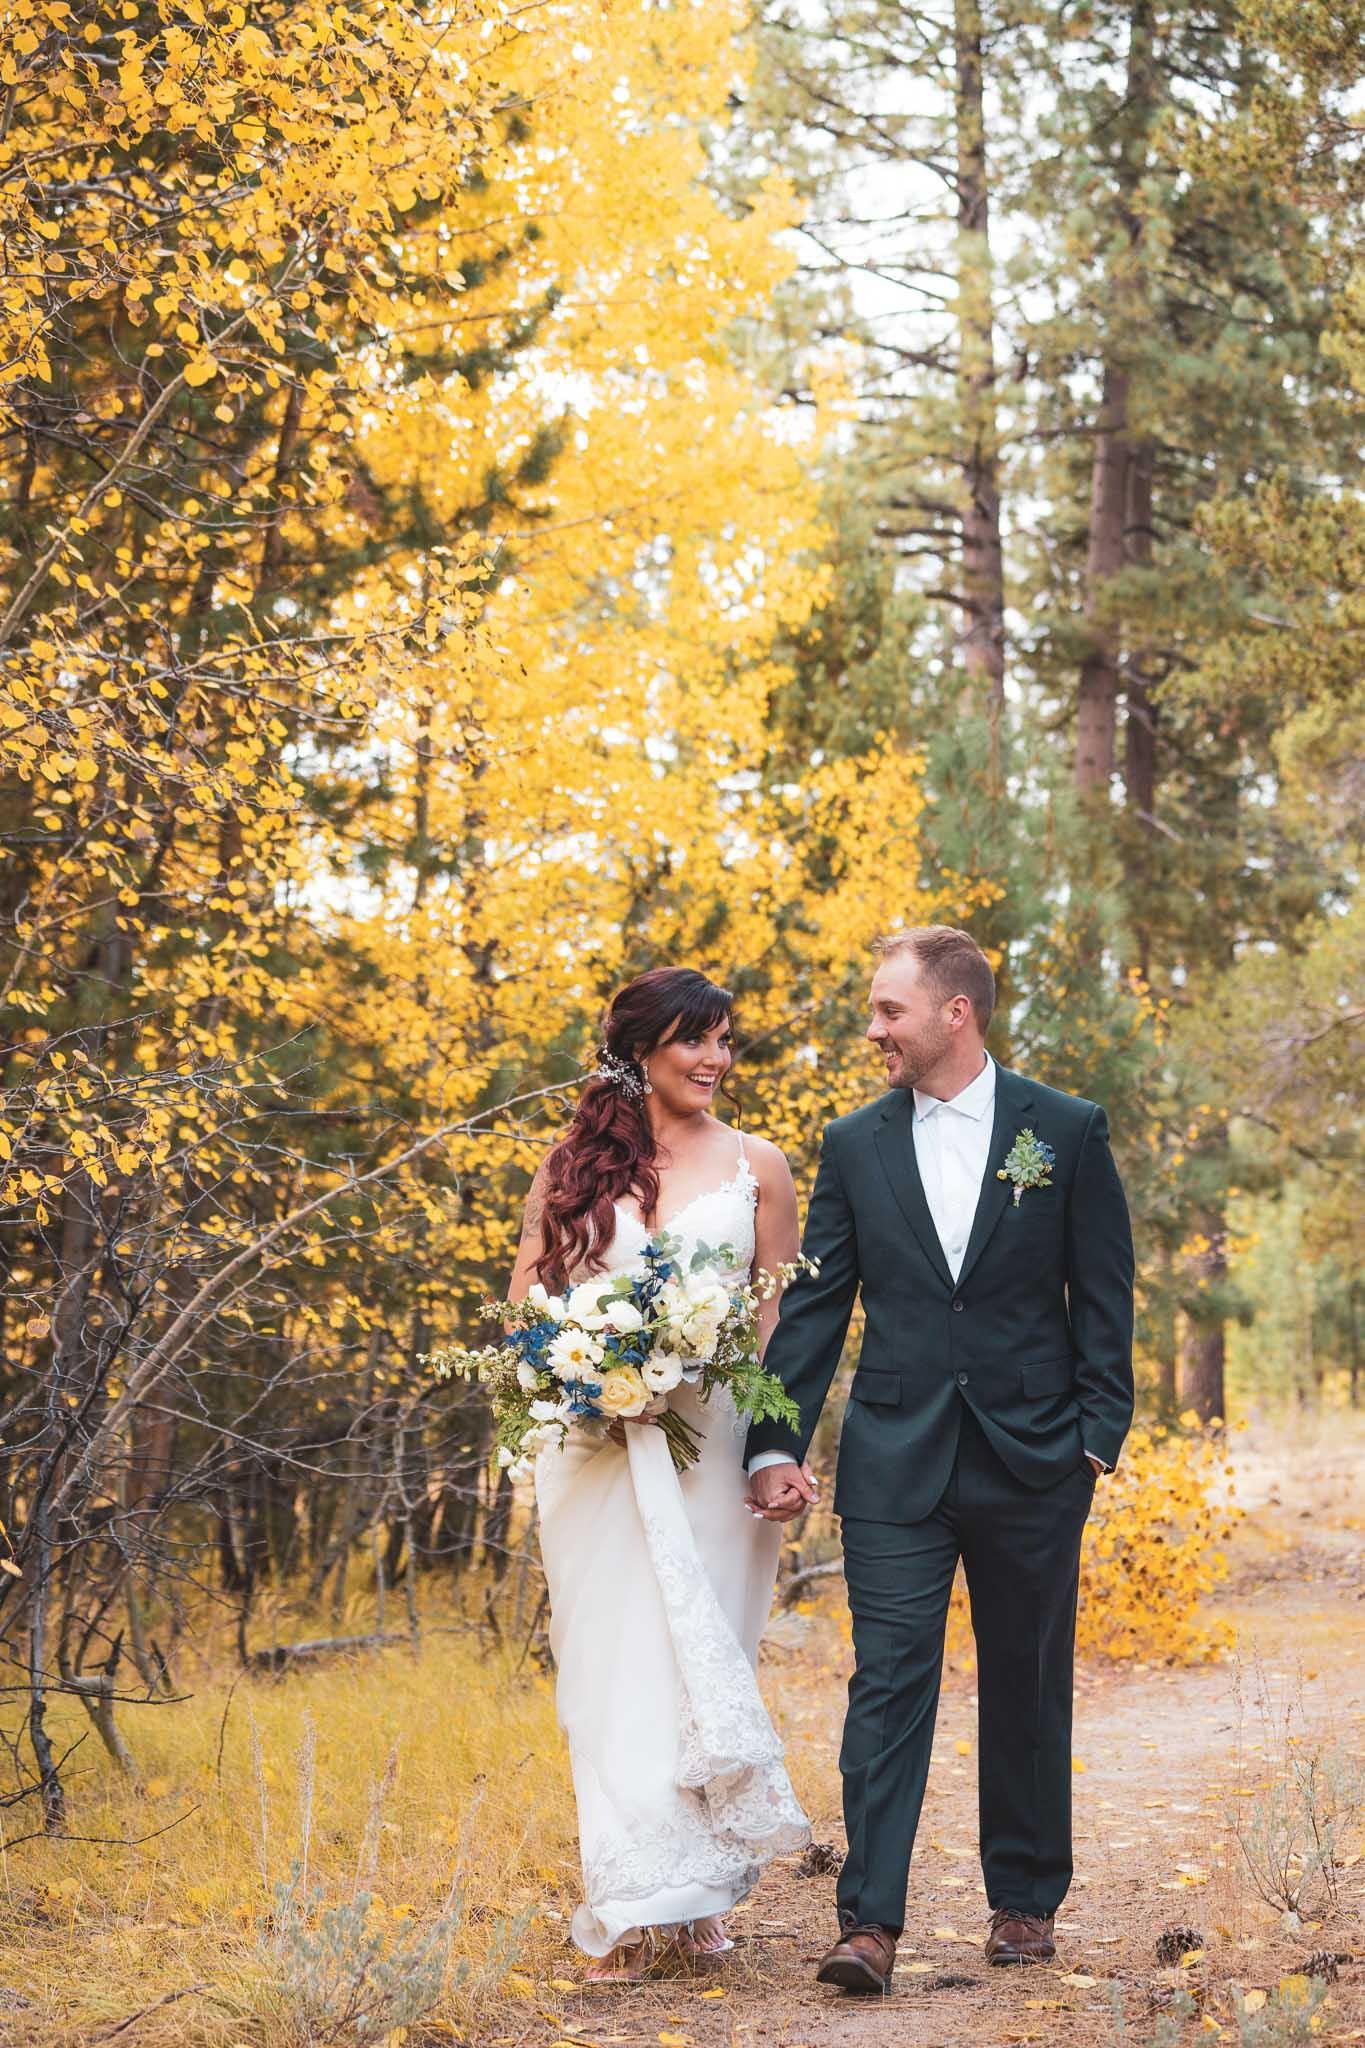 Bride and groom walking hand in hand between the aspens